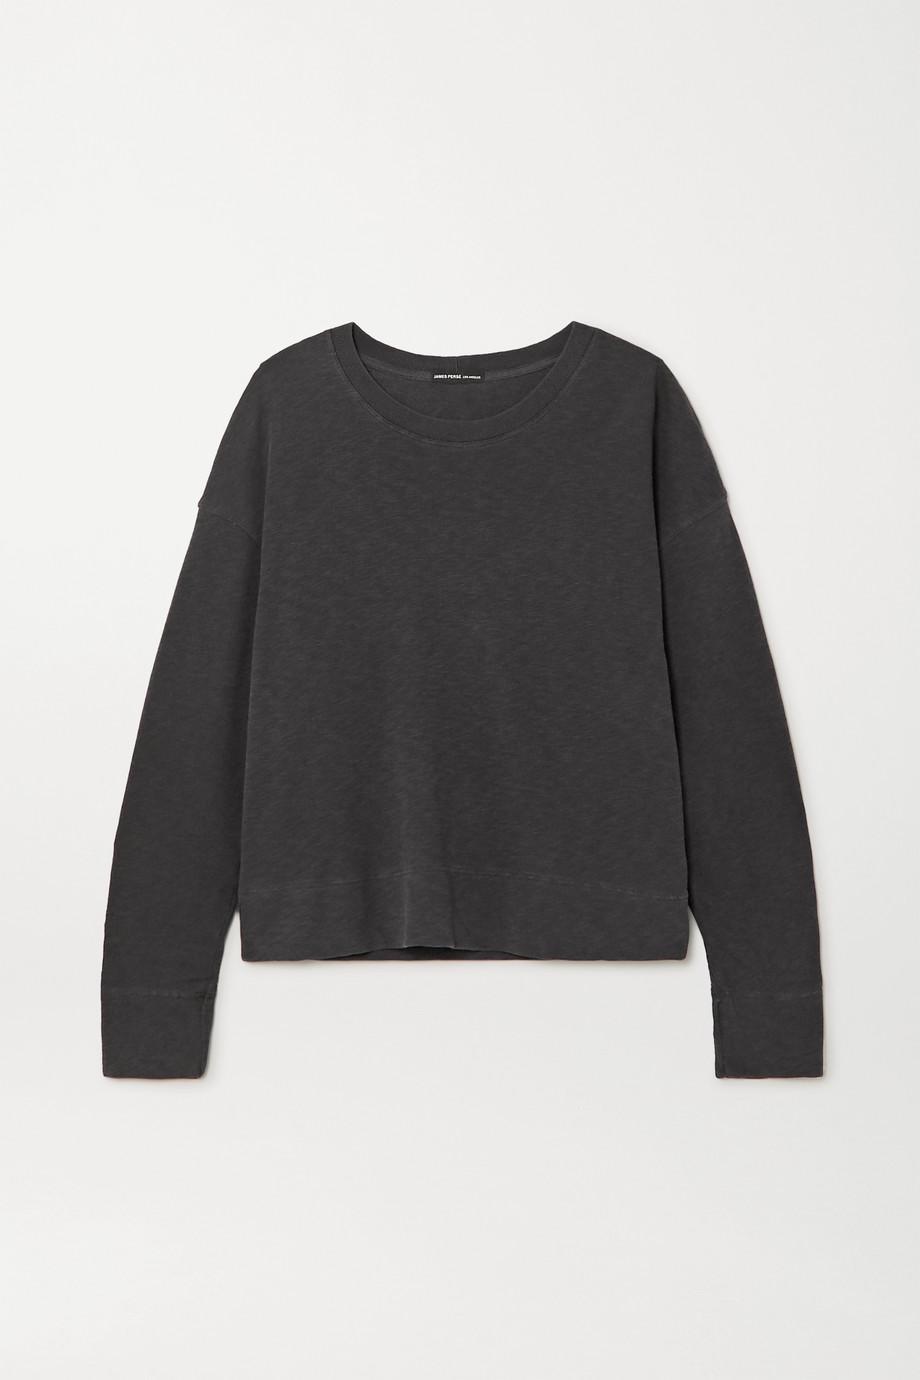 James Perse | Mélange cotton-jersey sweatshirt | NET-A-PORTER.COM